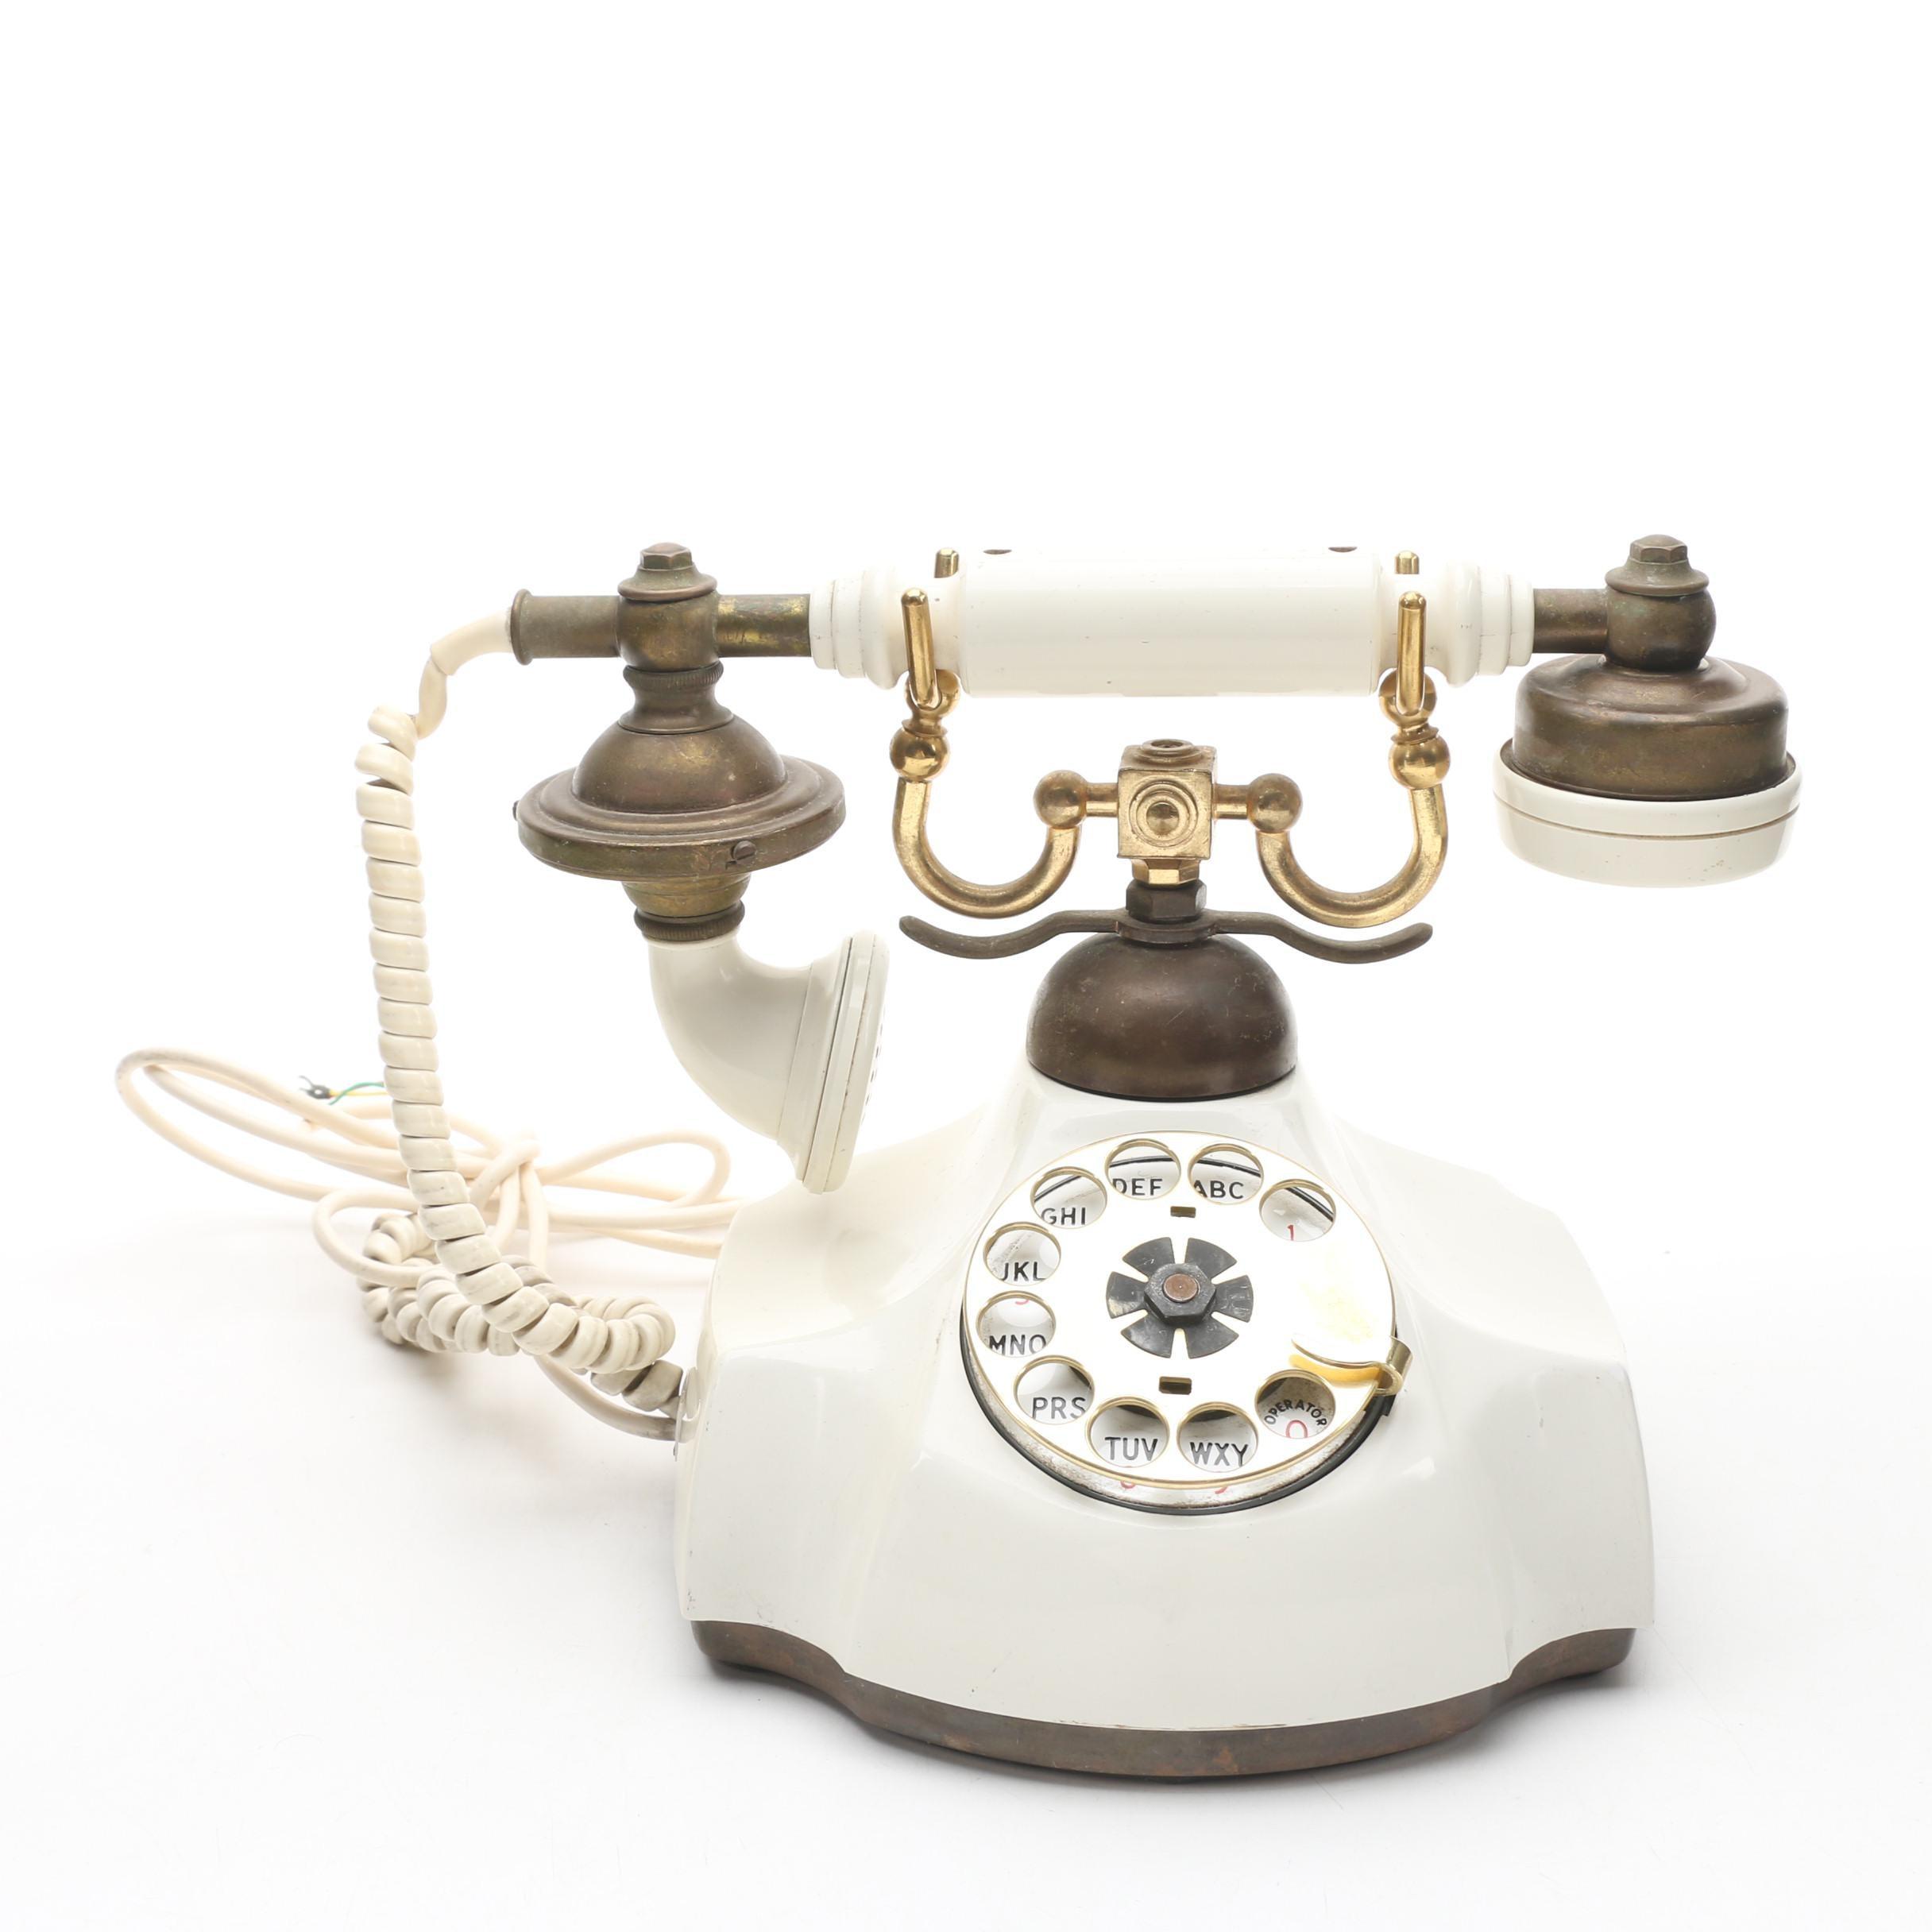 Vintage Ivory-Tone Rotary Telephone